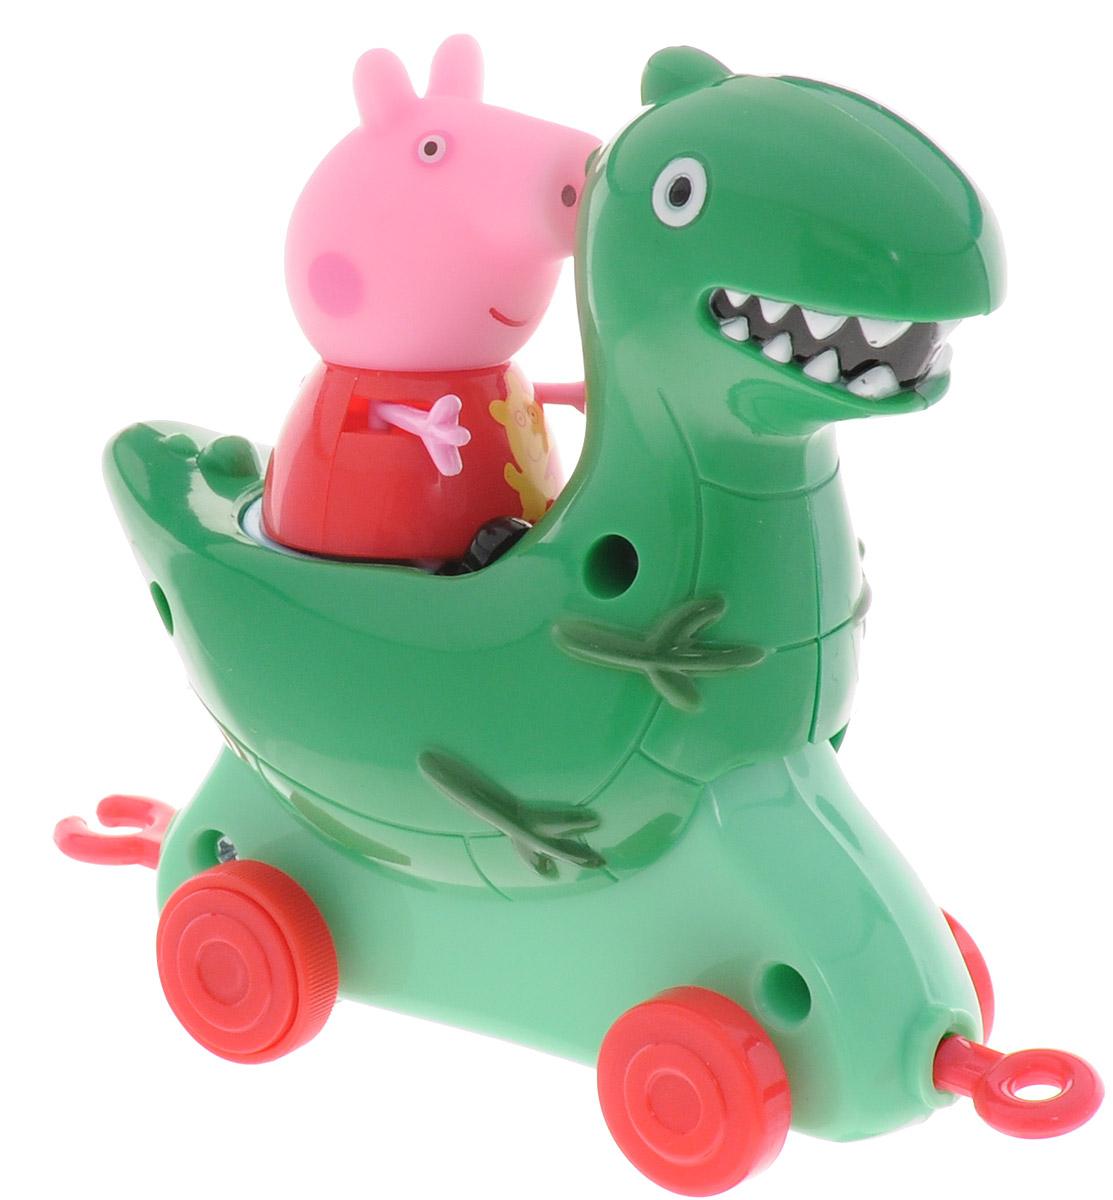 Peppa Pig Игровой набор Пеппа и Каталка Динозавр игровой набор пеппа и сьюзи peppa pig игровой набор пеппа и сьюзи